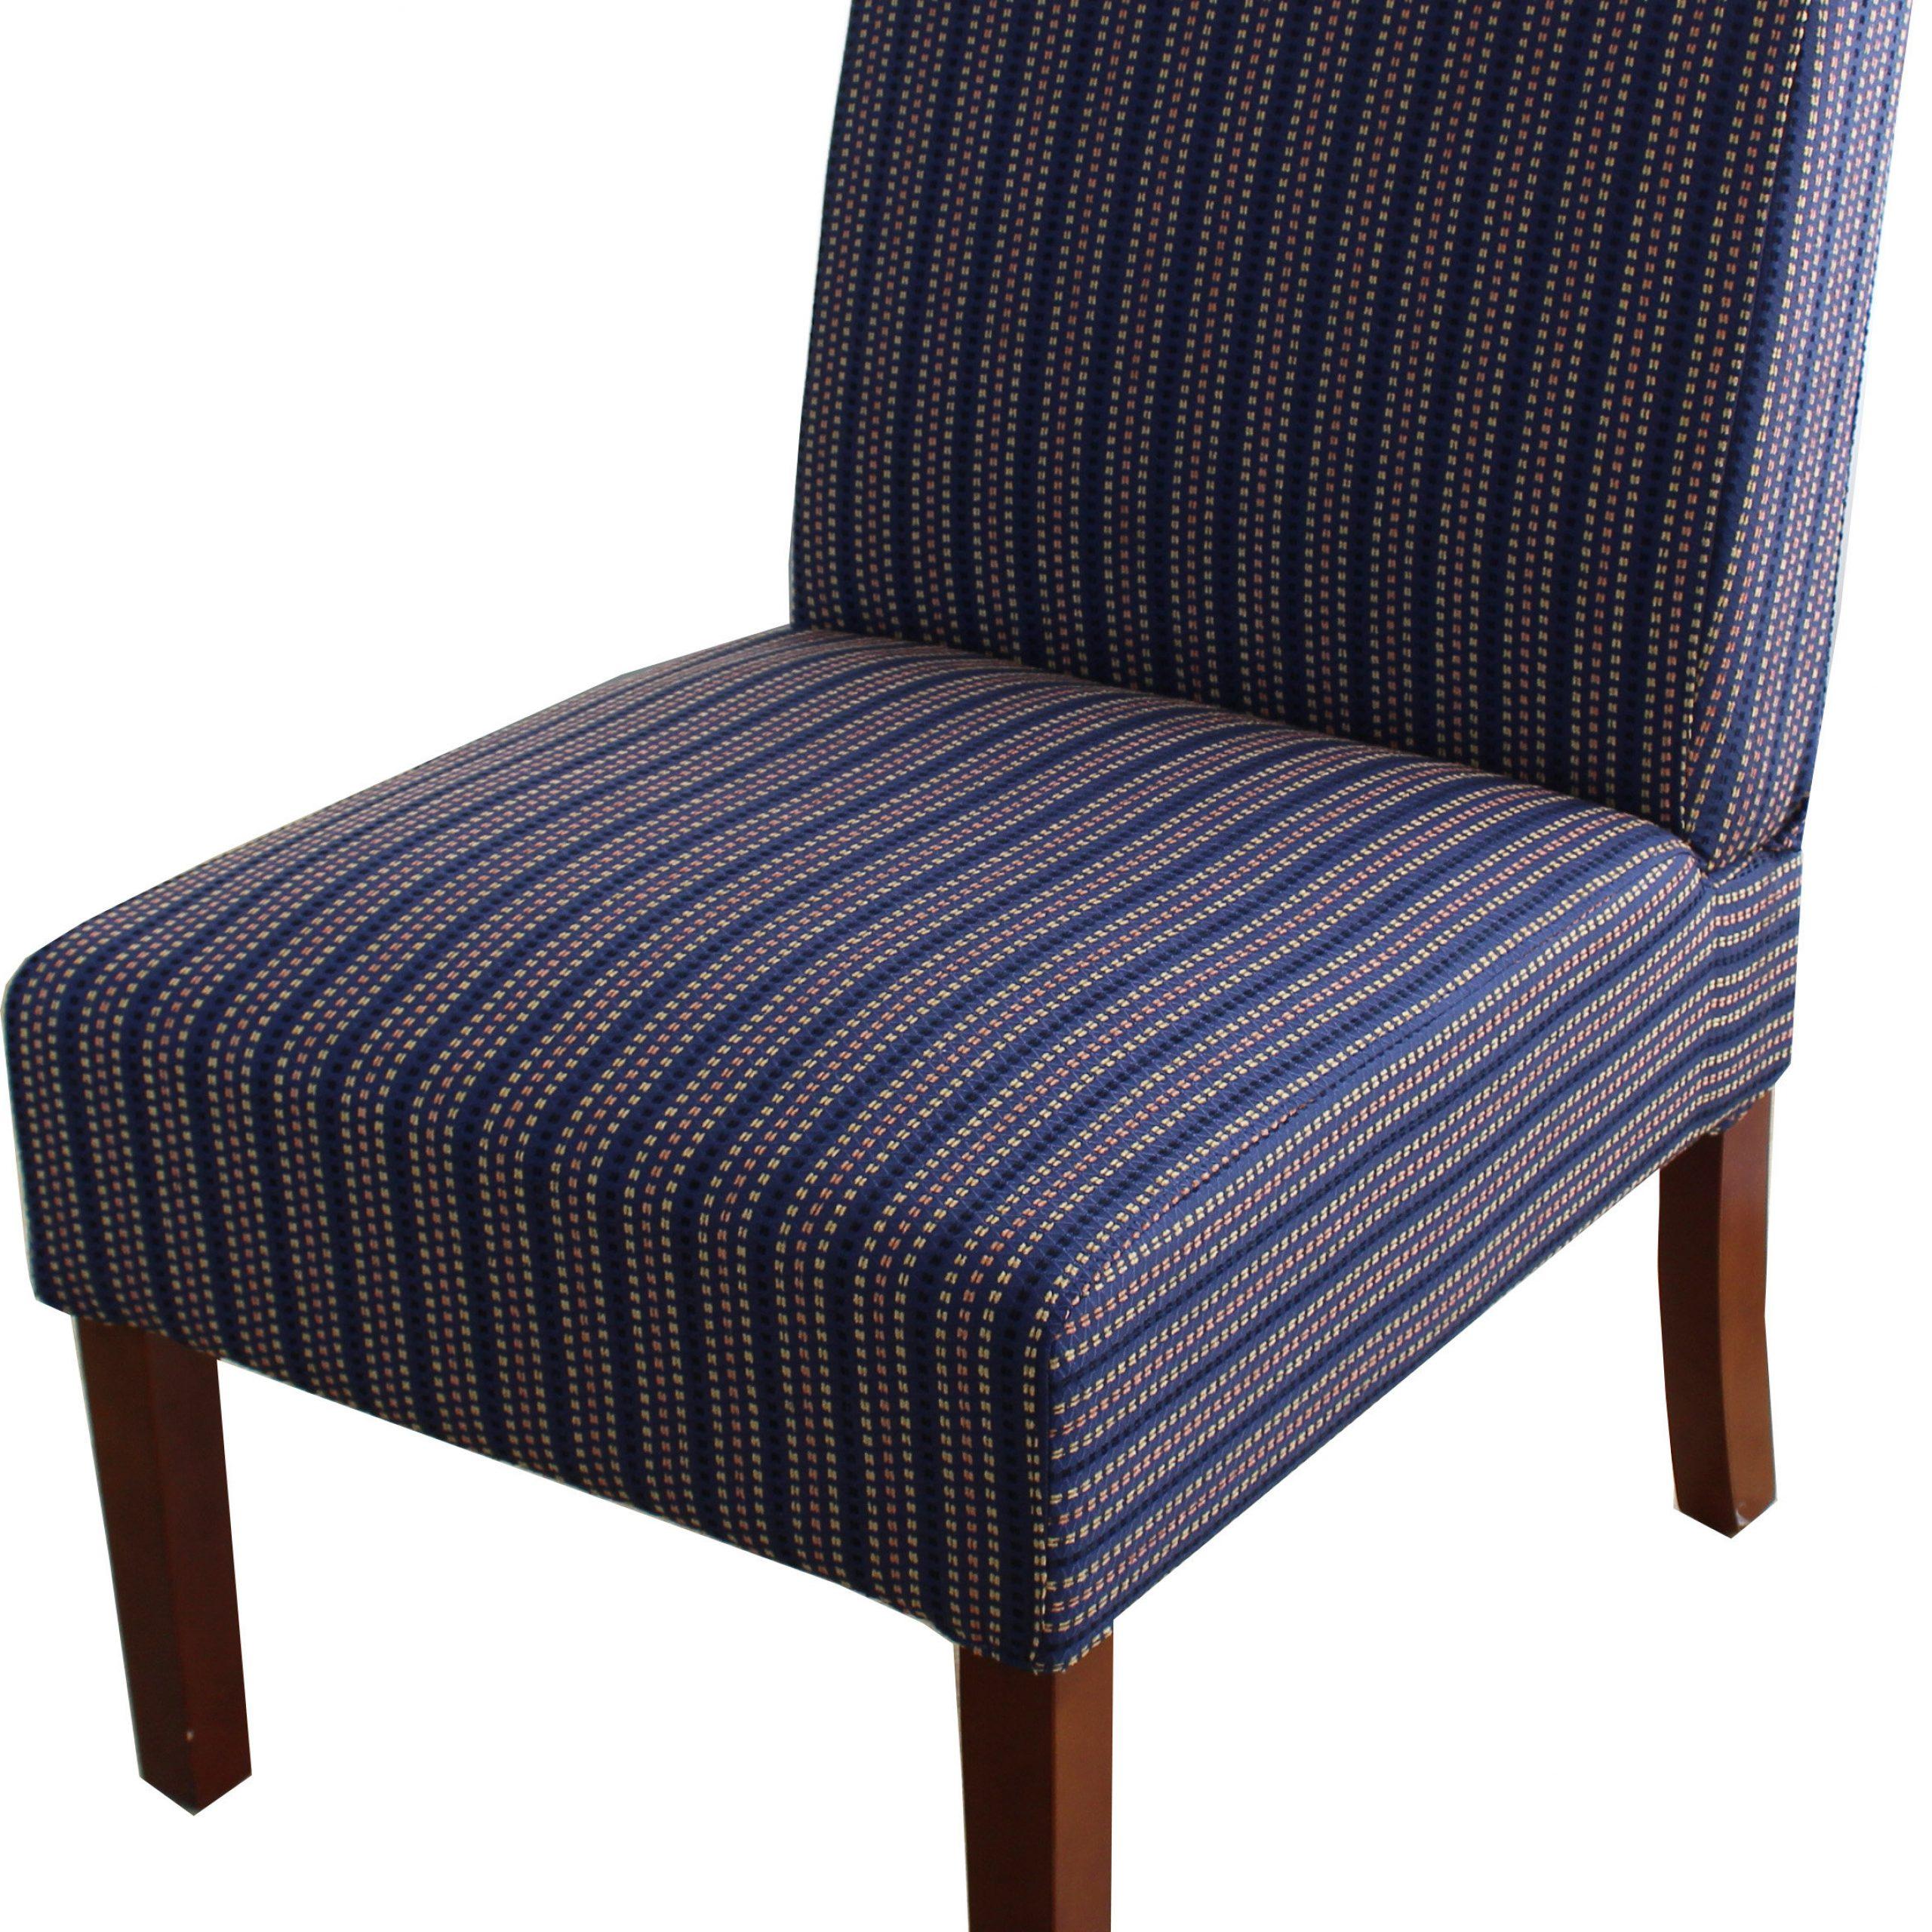 "Famous Wodehouse 22"" Slipper Chair Pertaining To Aniruddha Slipper Chairs (View 2 of 20)"